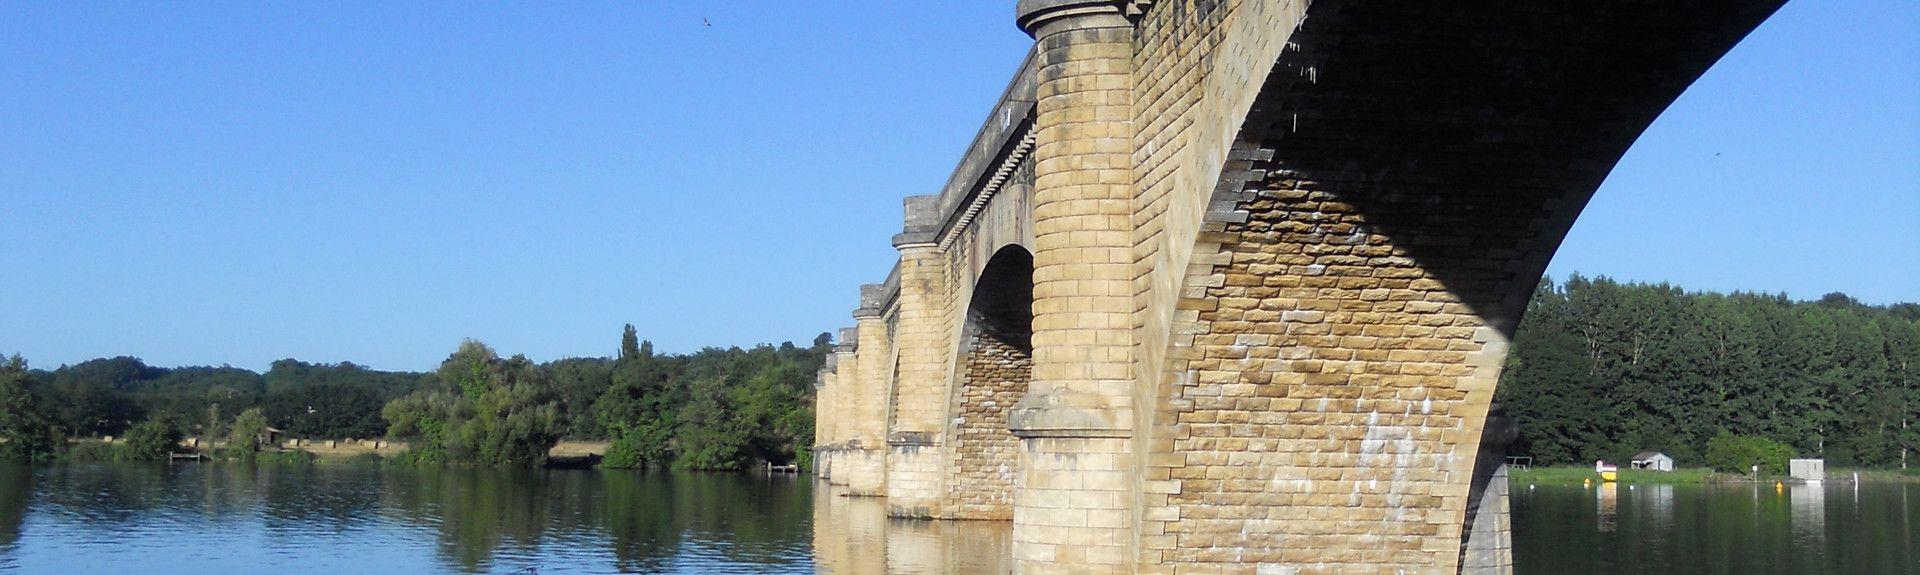 Cales, Dordogne, France